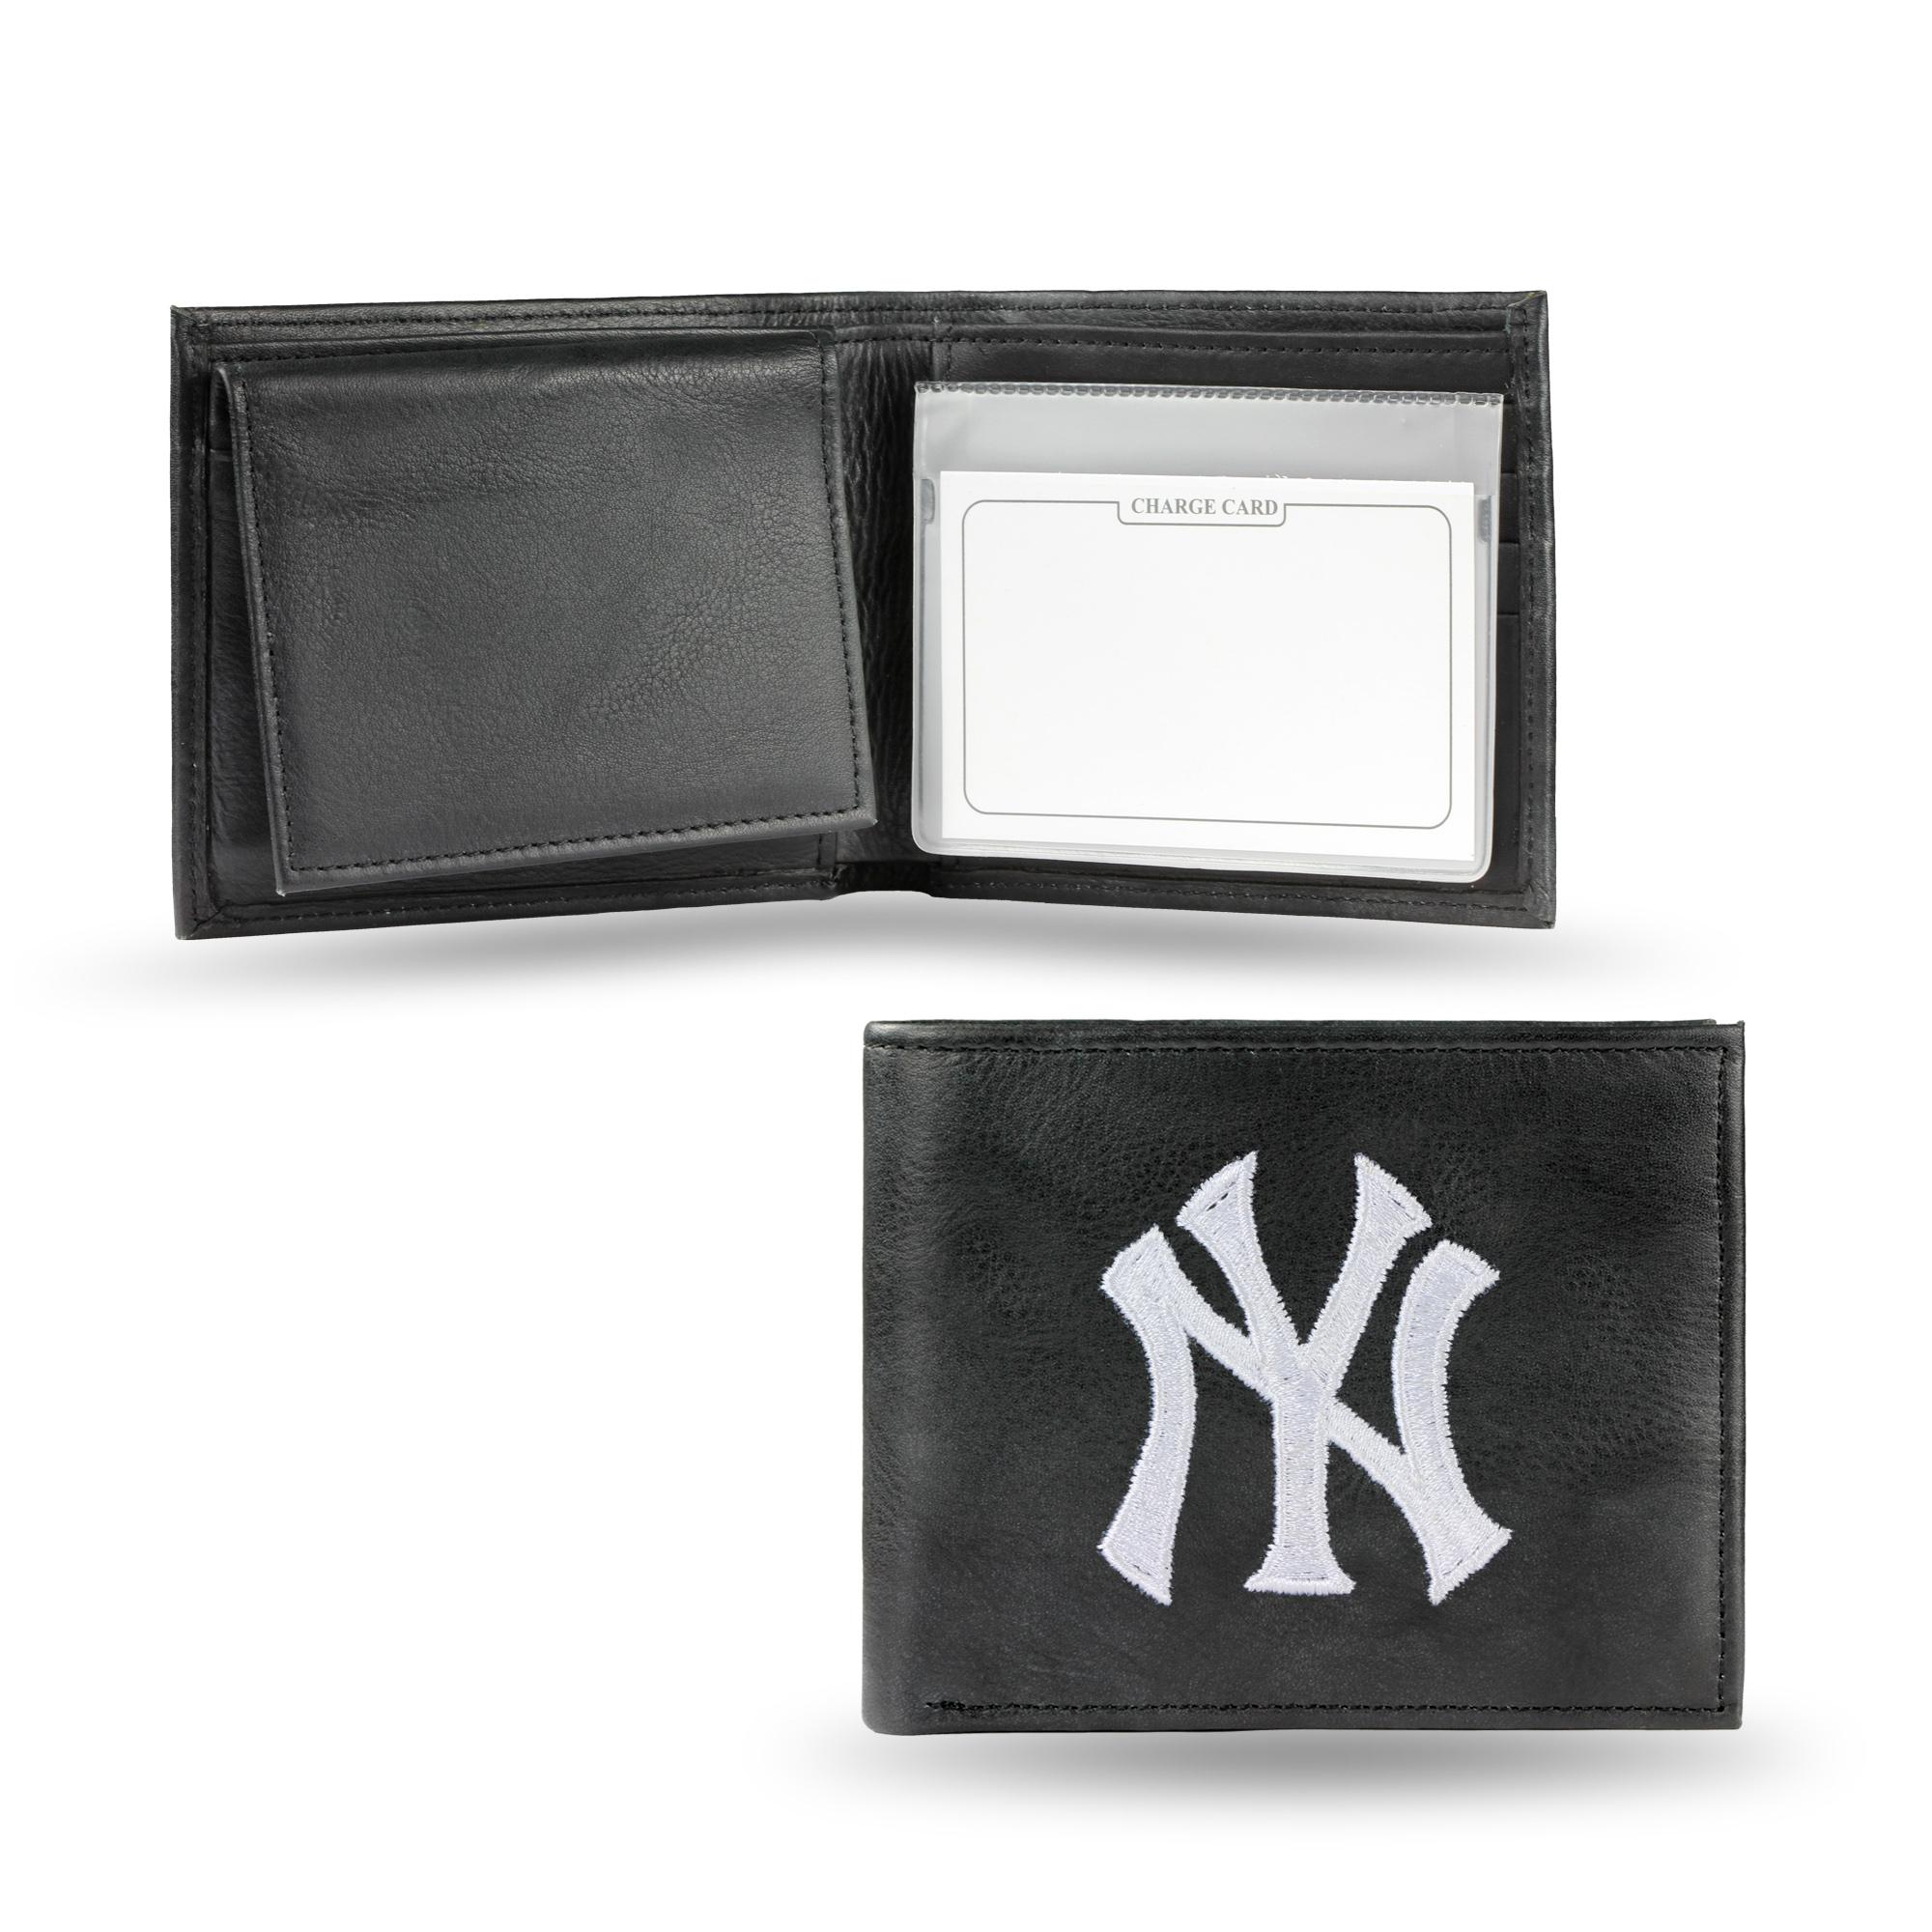 MLB Embroidered Billfold - New York Yankees